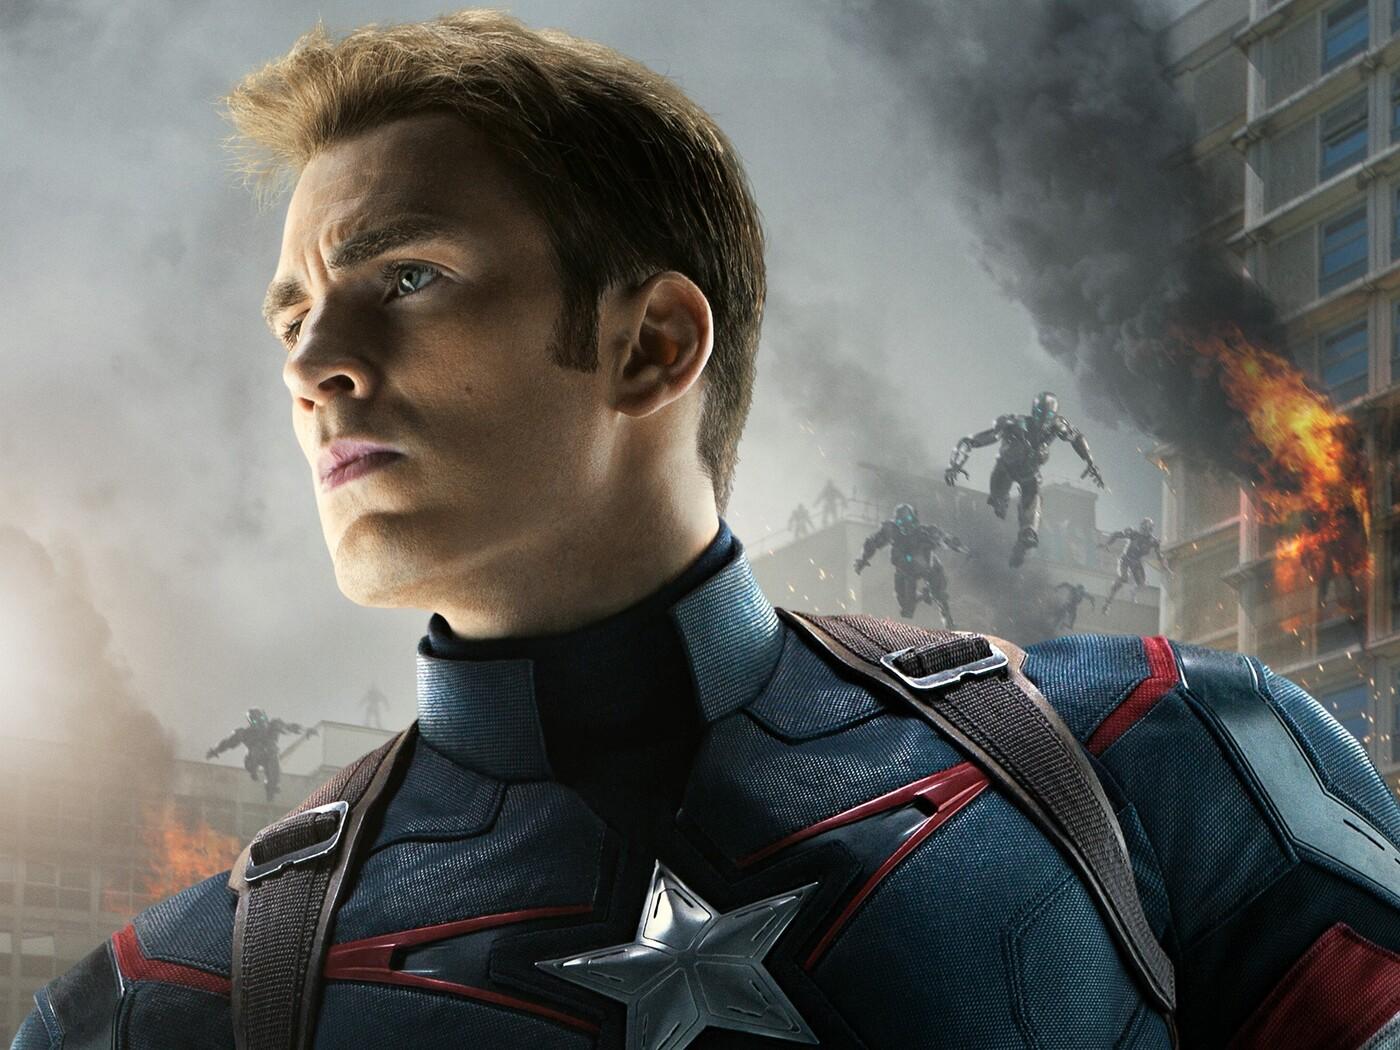 captain-america-in-avengers-age-of-ultron.jpg